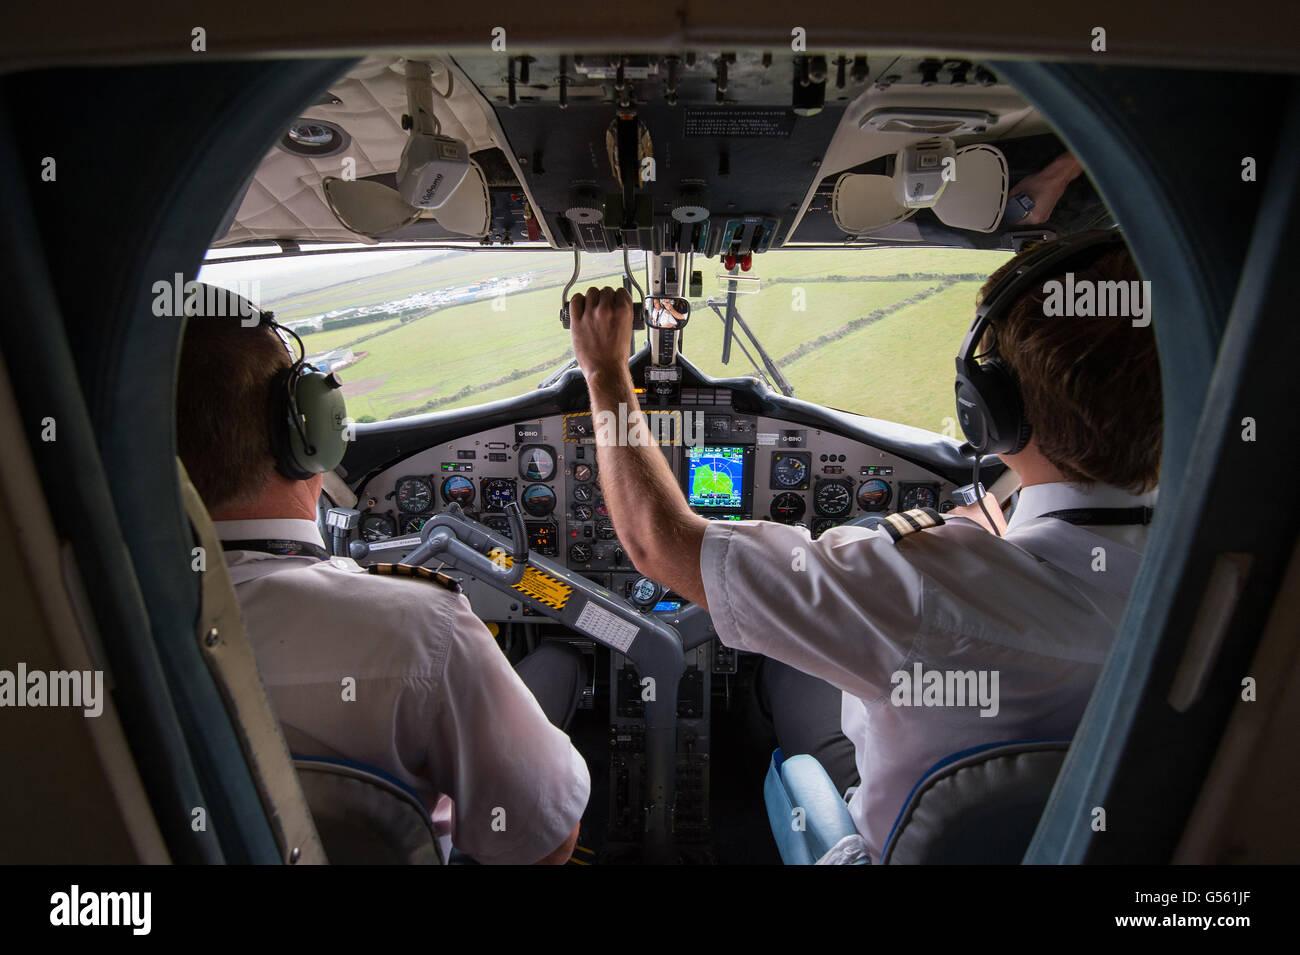 Aircraft Cockpit with pilot and navigator - Stock Image